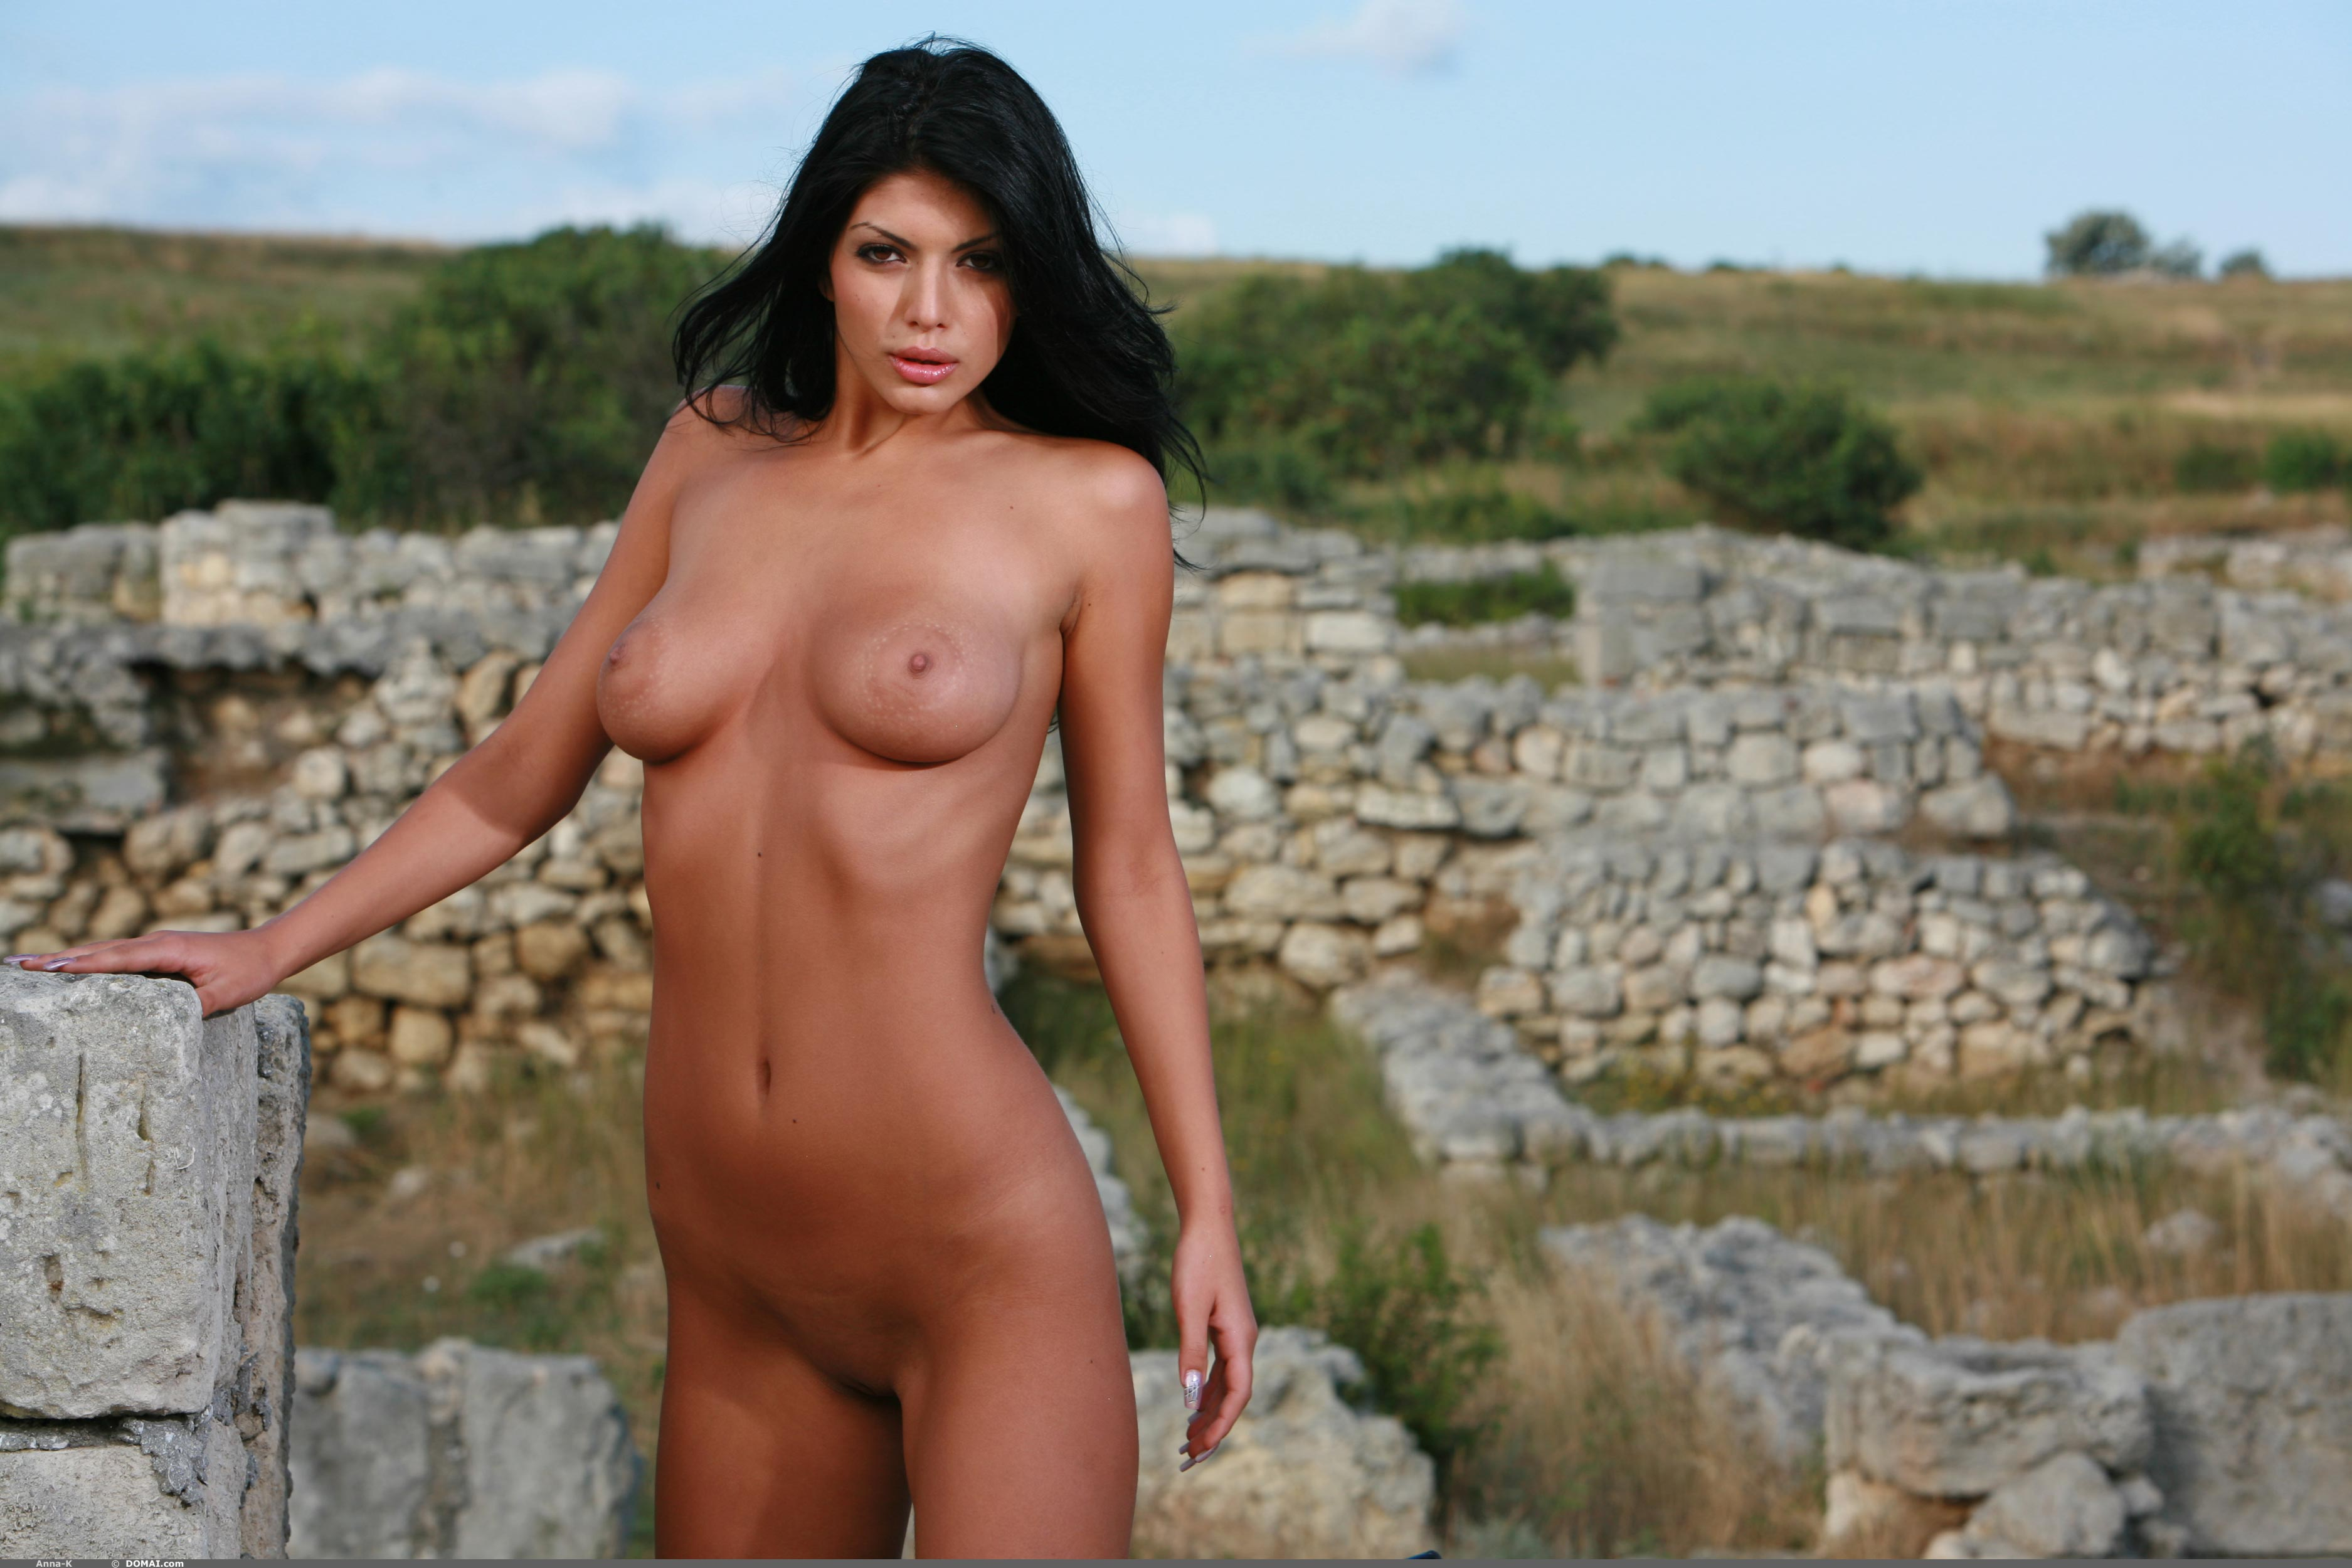 Секси фото ани лорак, Голая Ани Лорак - 99 фото 10 фотография